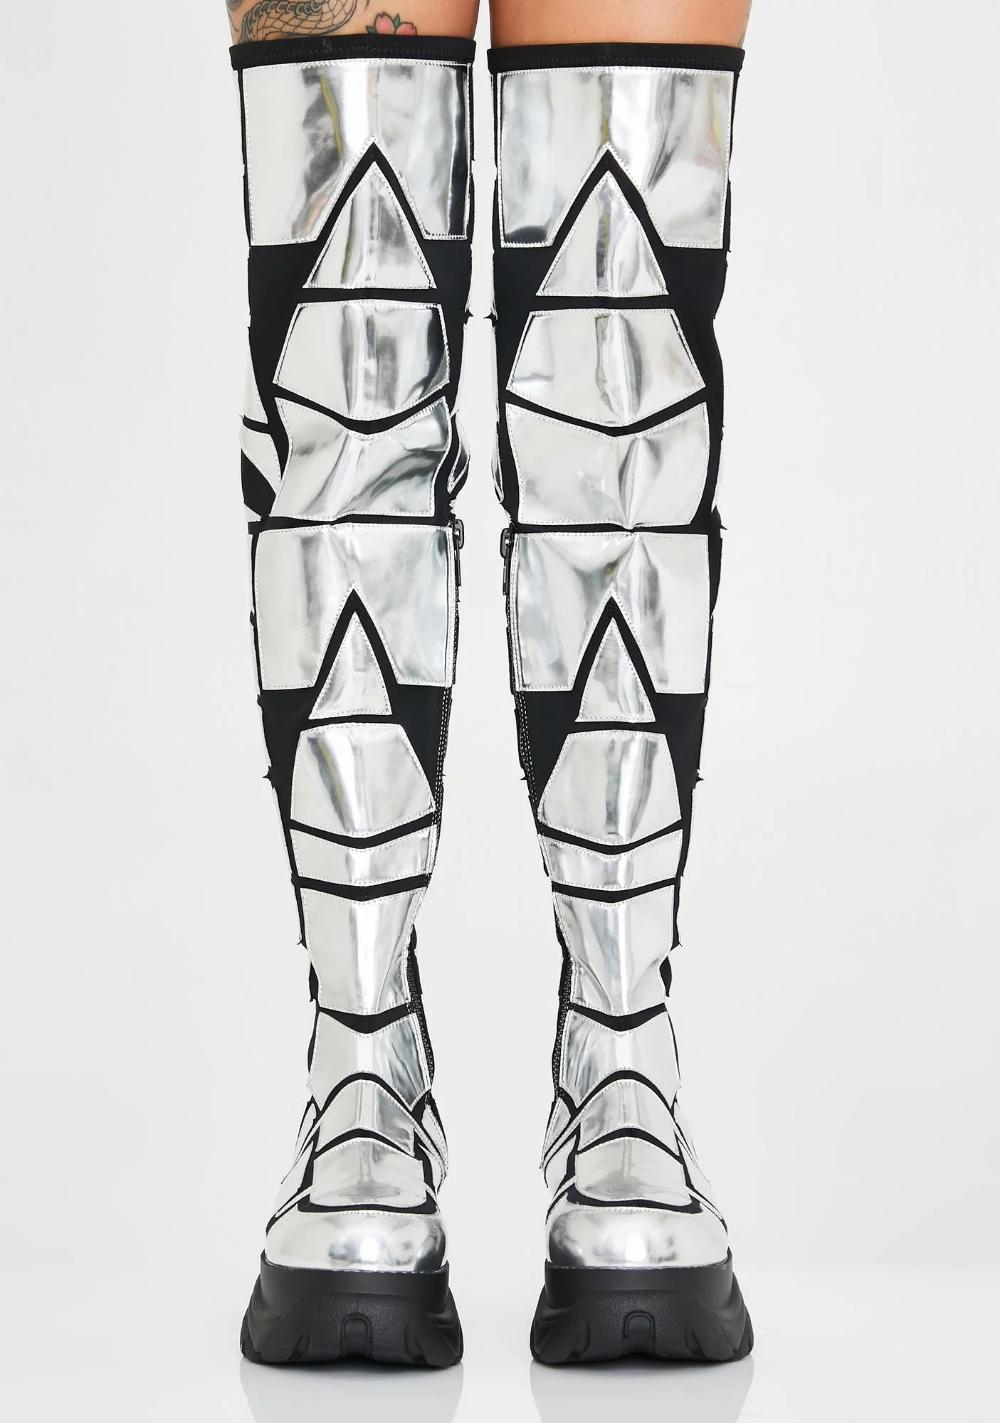 Club Exx Metallic Armor Thigh High Boots Dolls Kill Thigh High Boots Heels